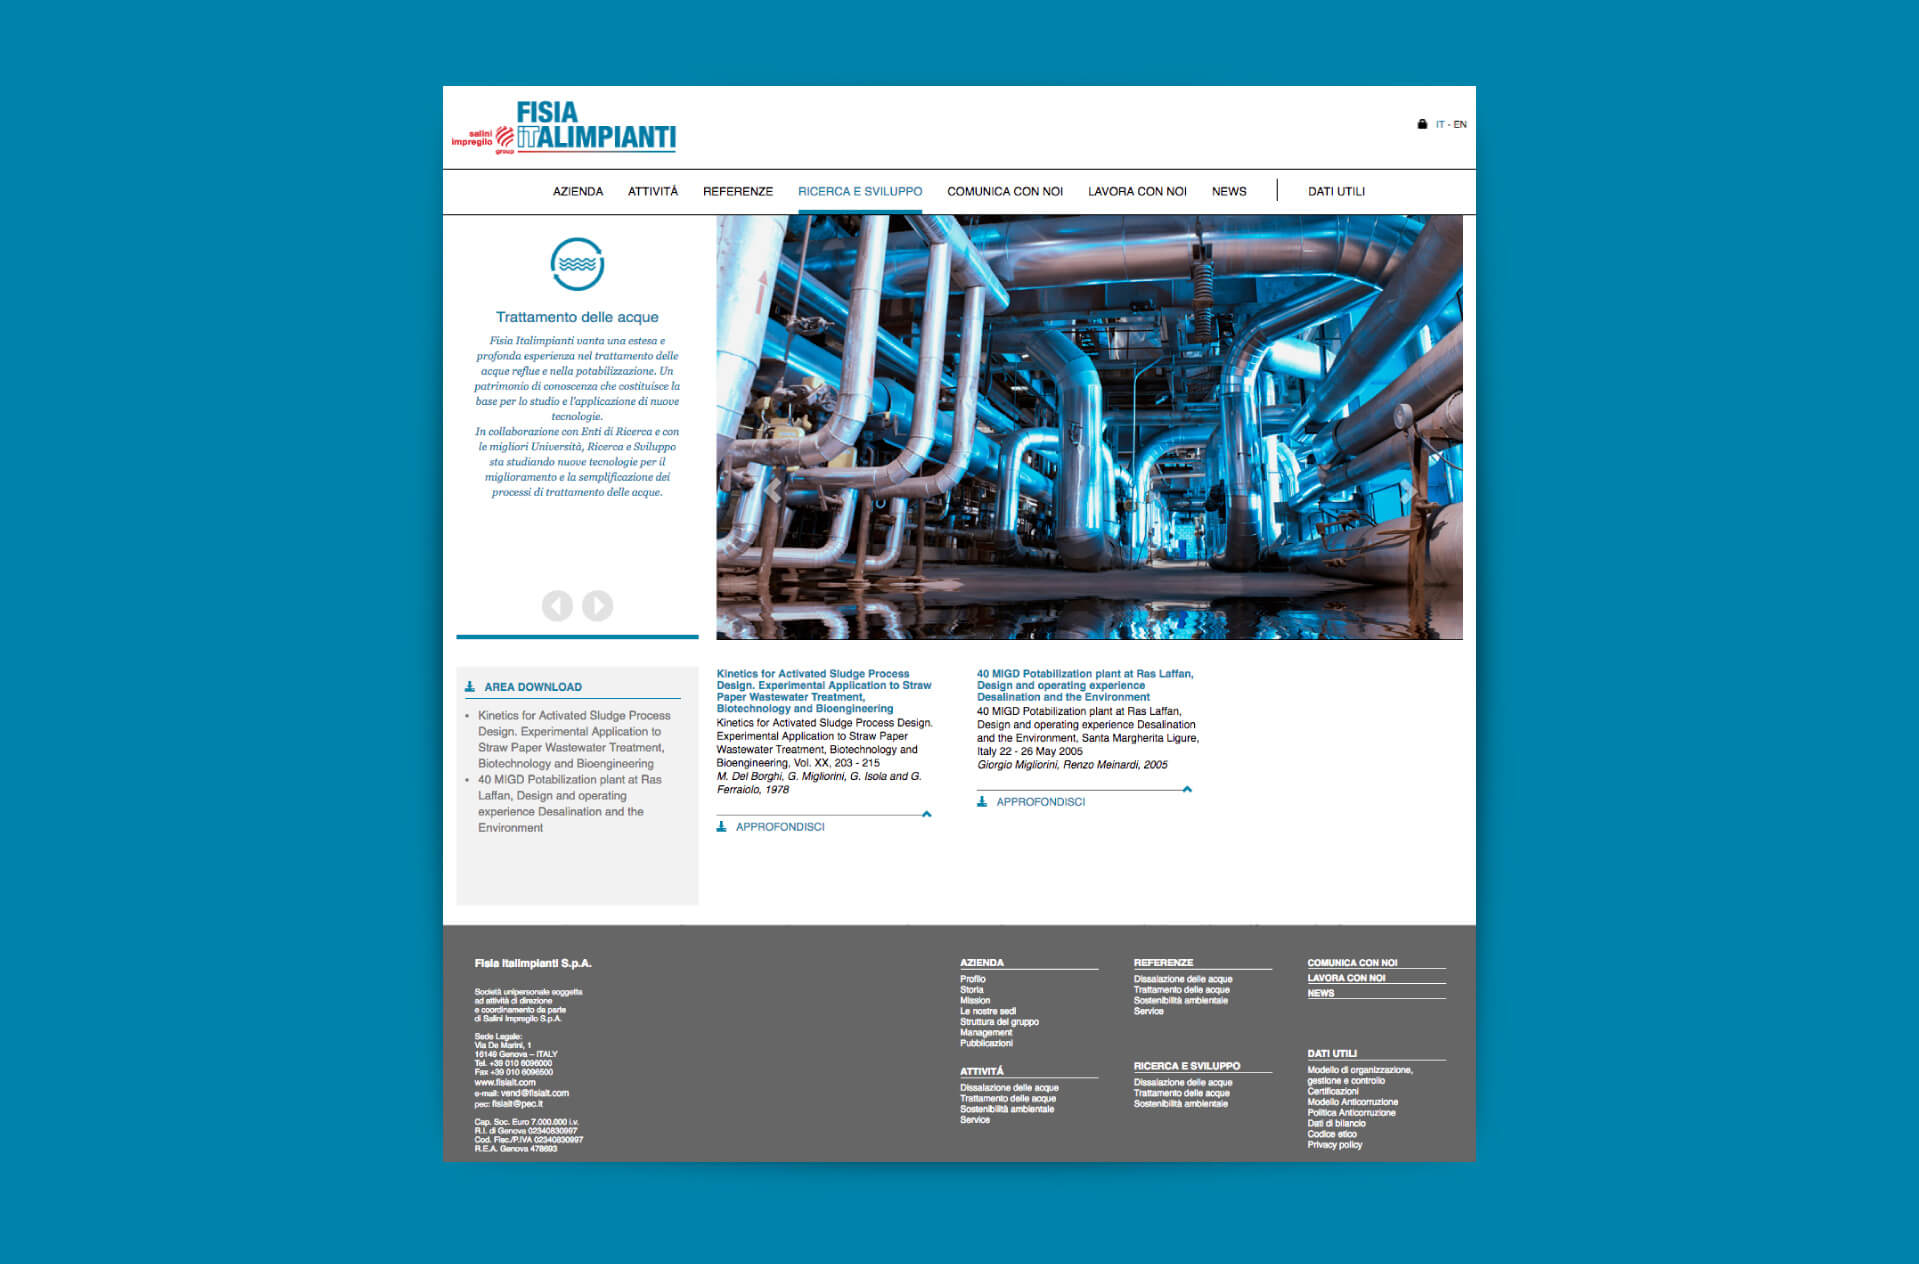 mintlab-webdesign-fisia-italimpianti-05